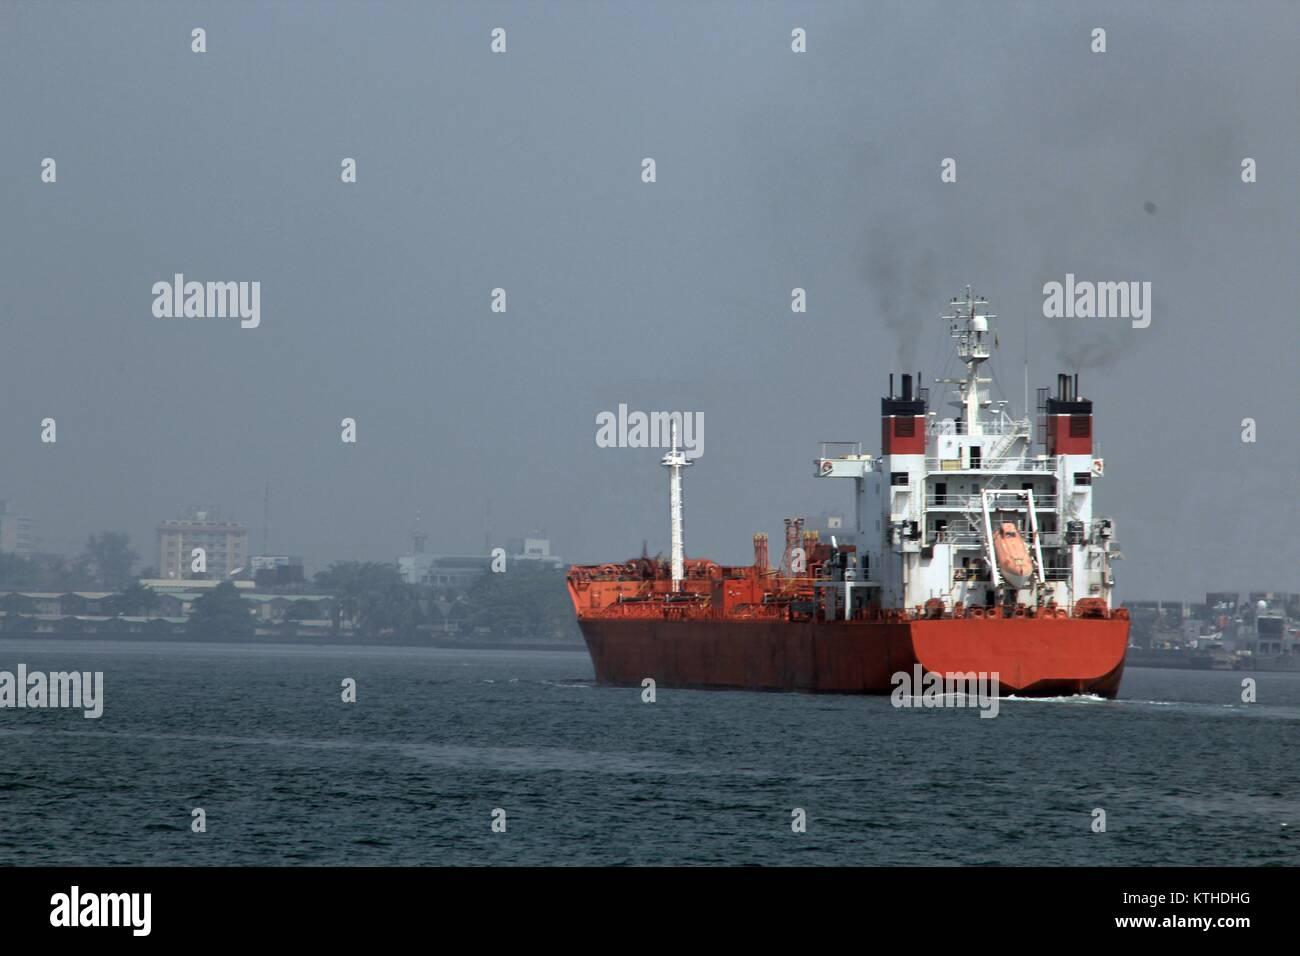 oil tanker - Stock Image